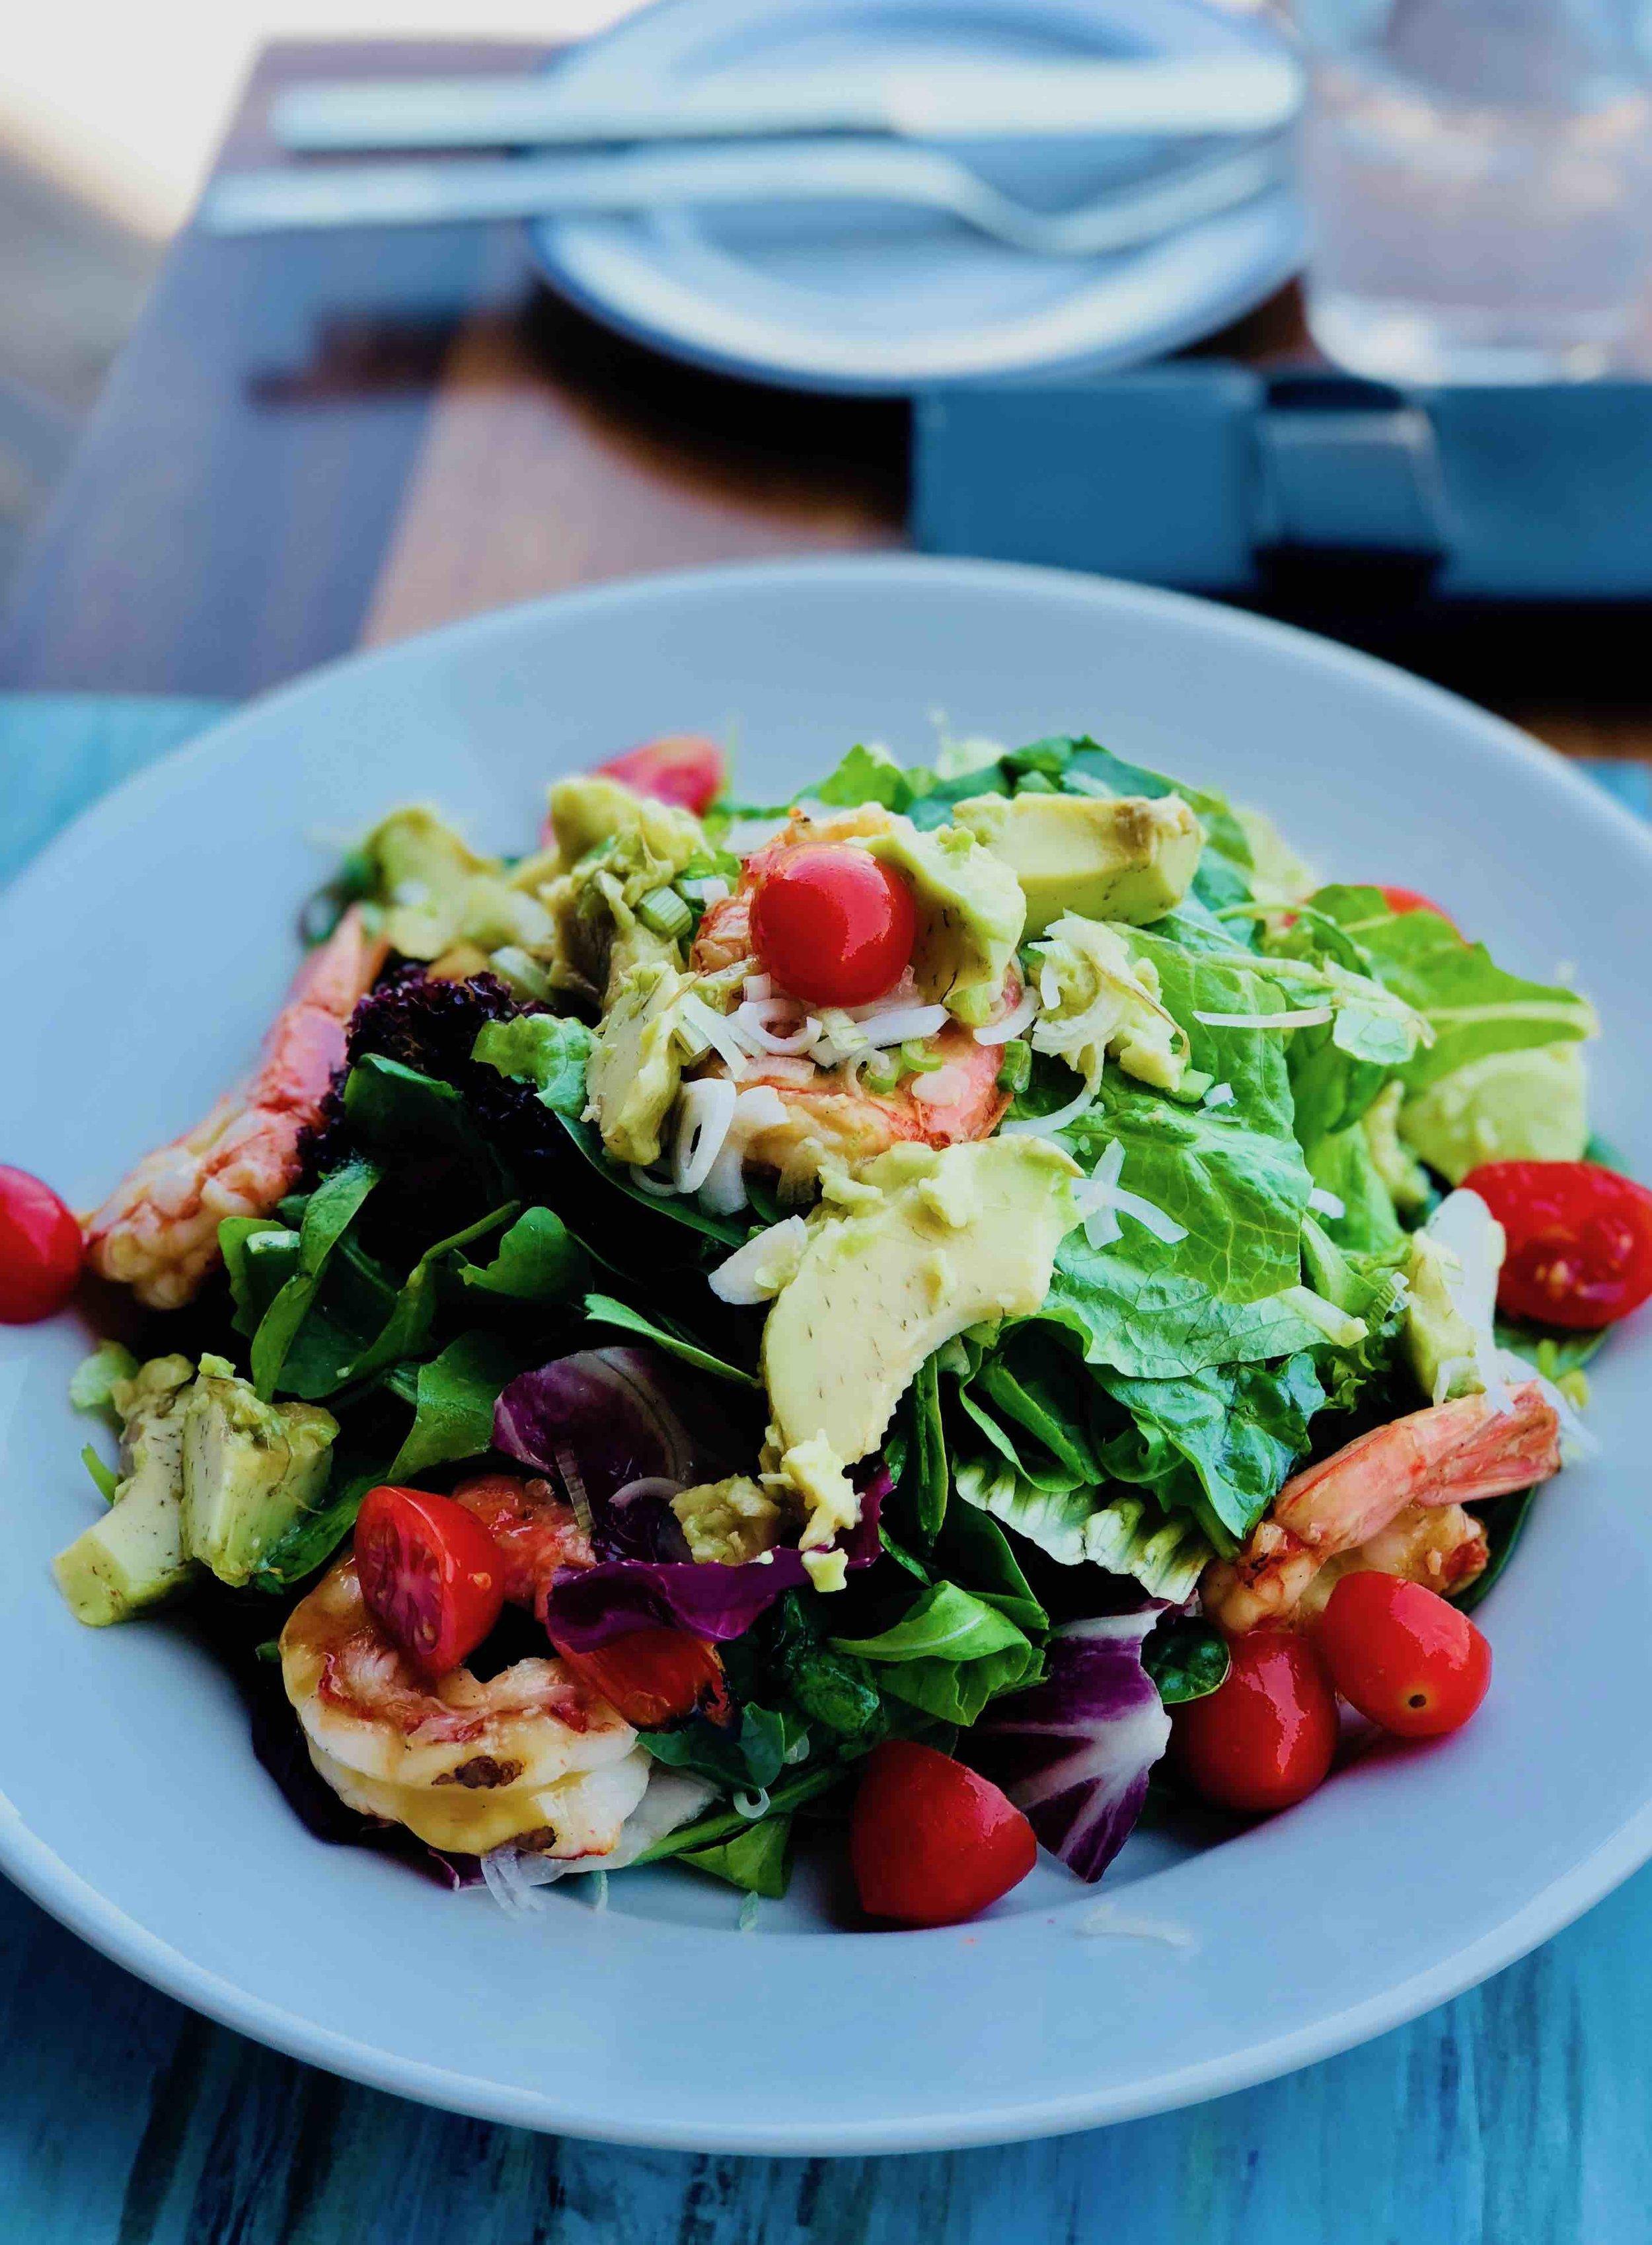 Salad at St. Nicolas